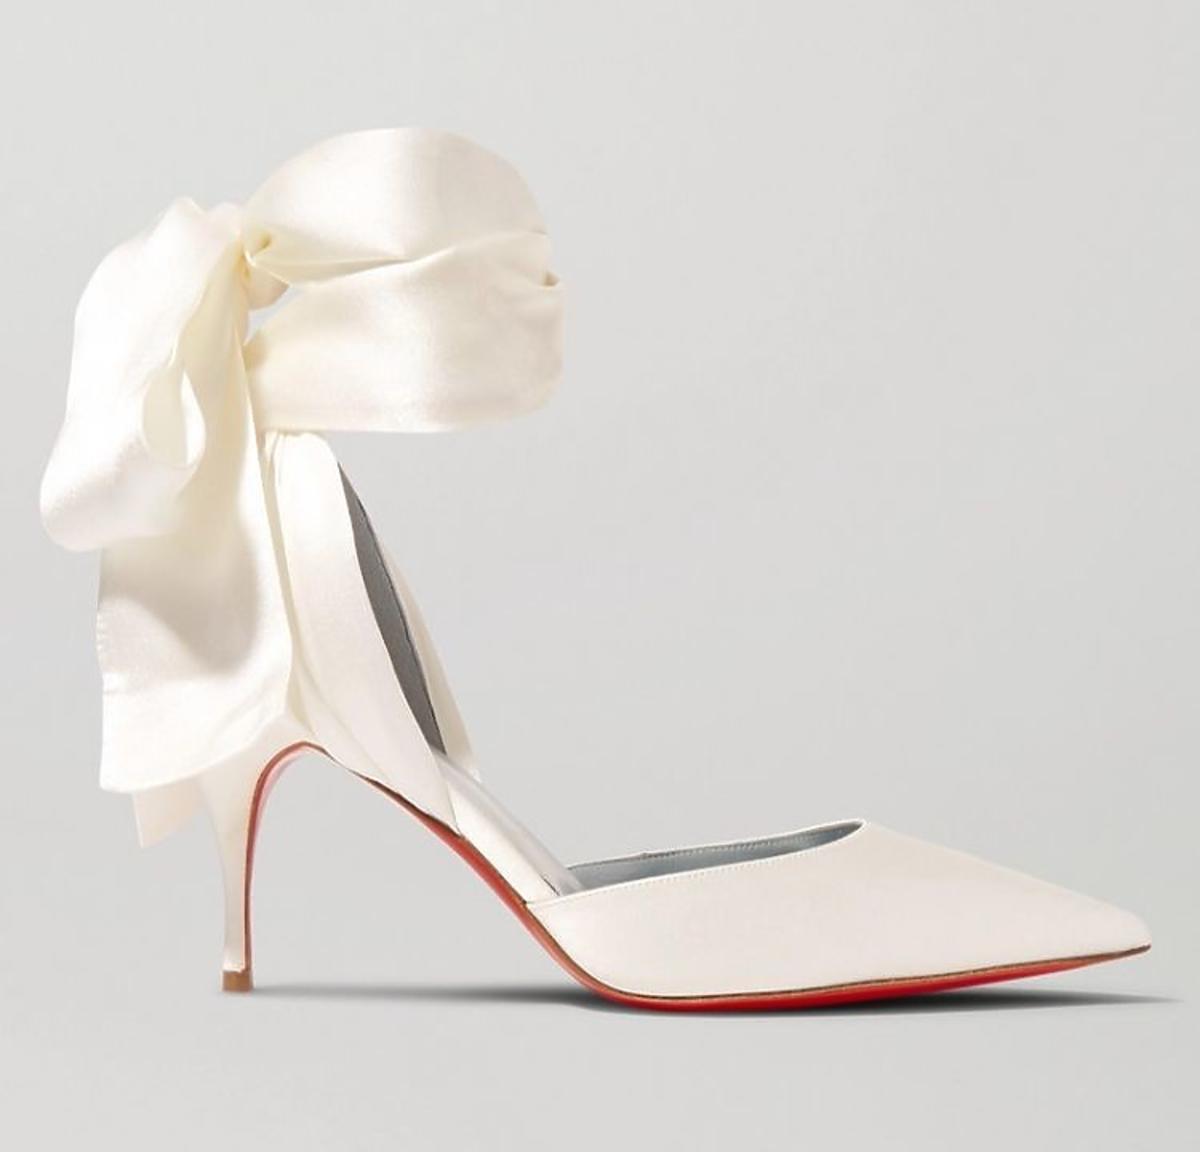 Buty ślubne trendy 2020-Christian Louboutin